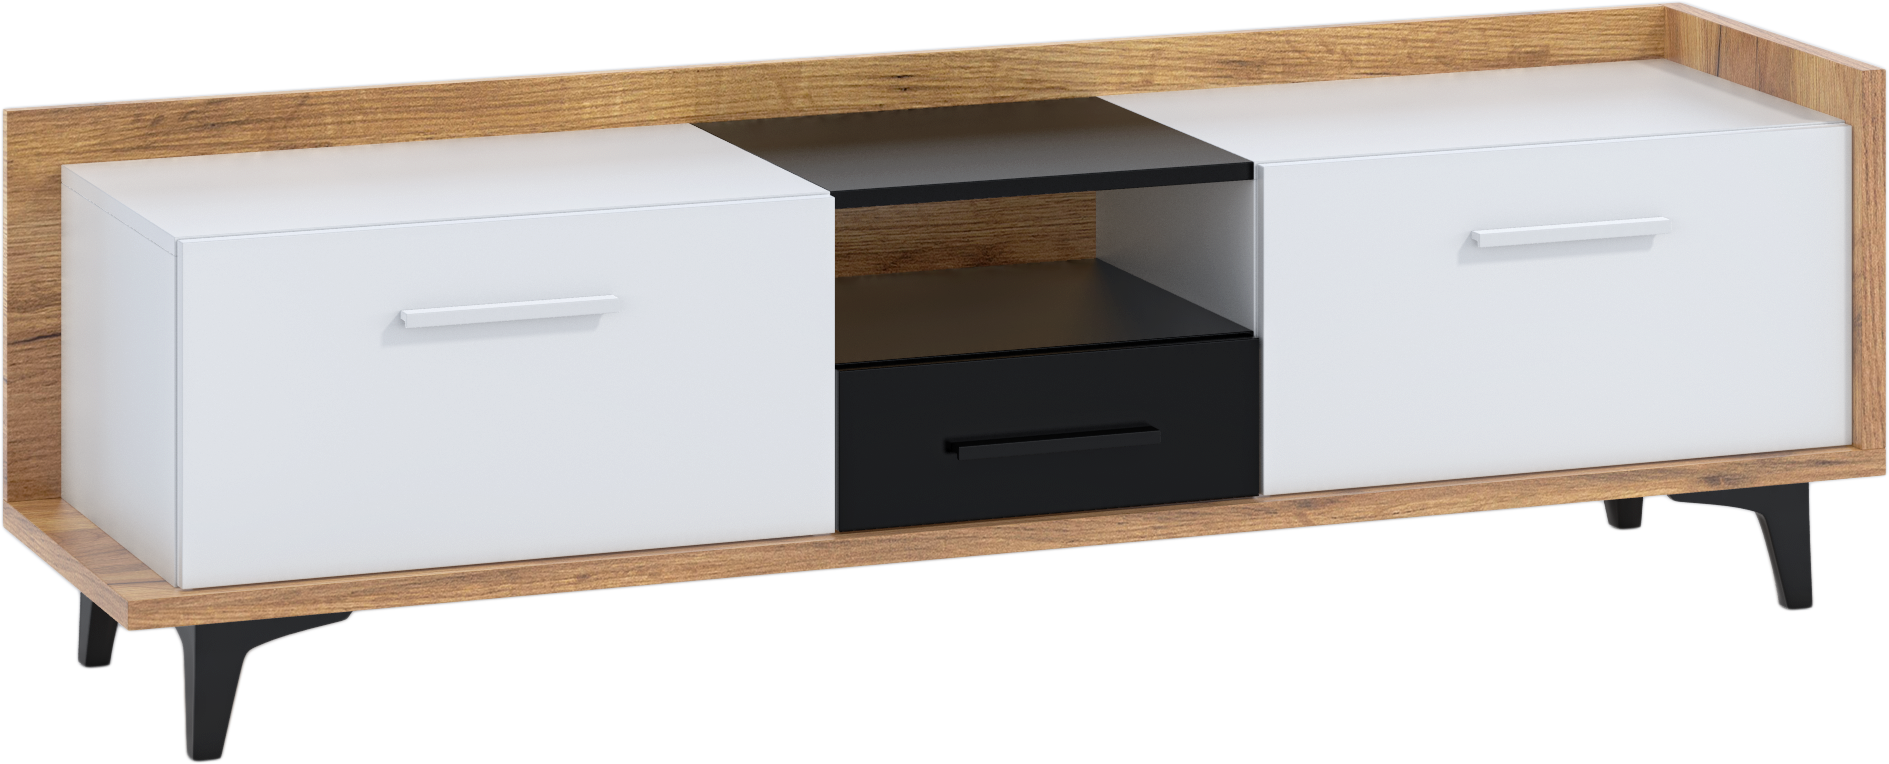 WIP TV stolík 2D1S BOX-09 Farba: craft zlatý / biela / čierna